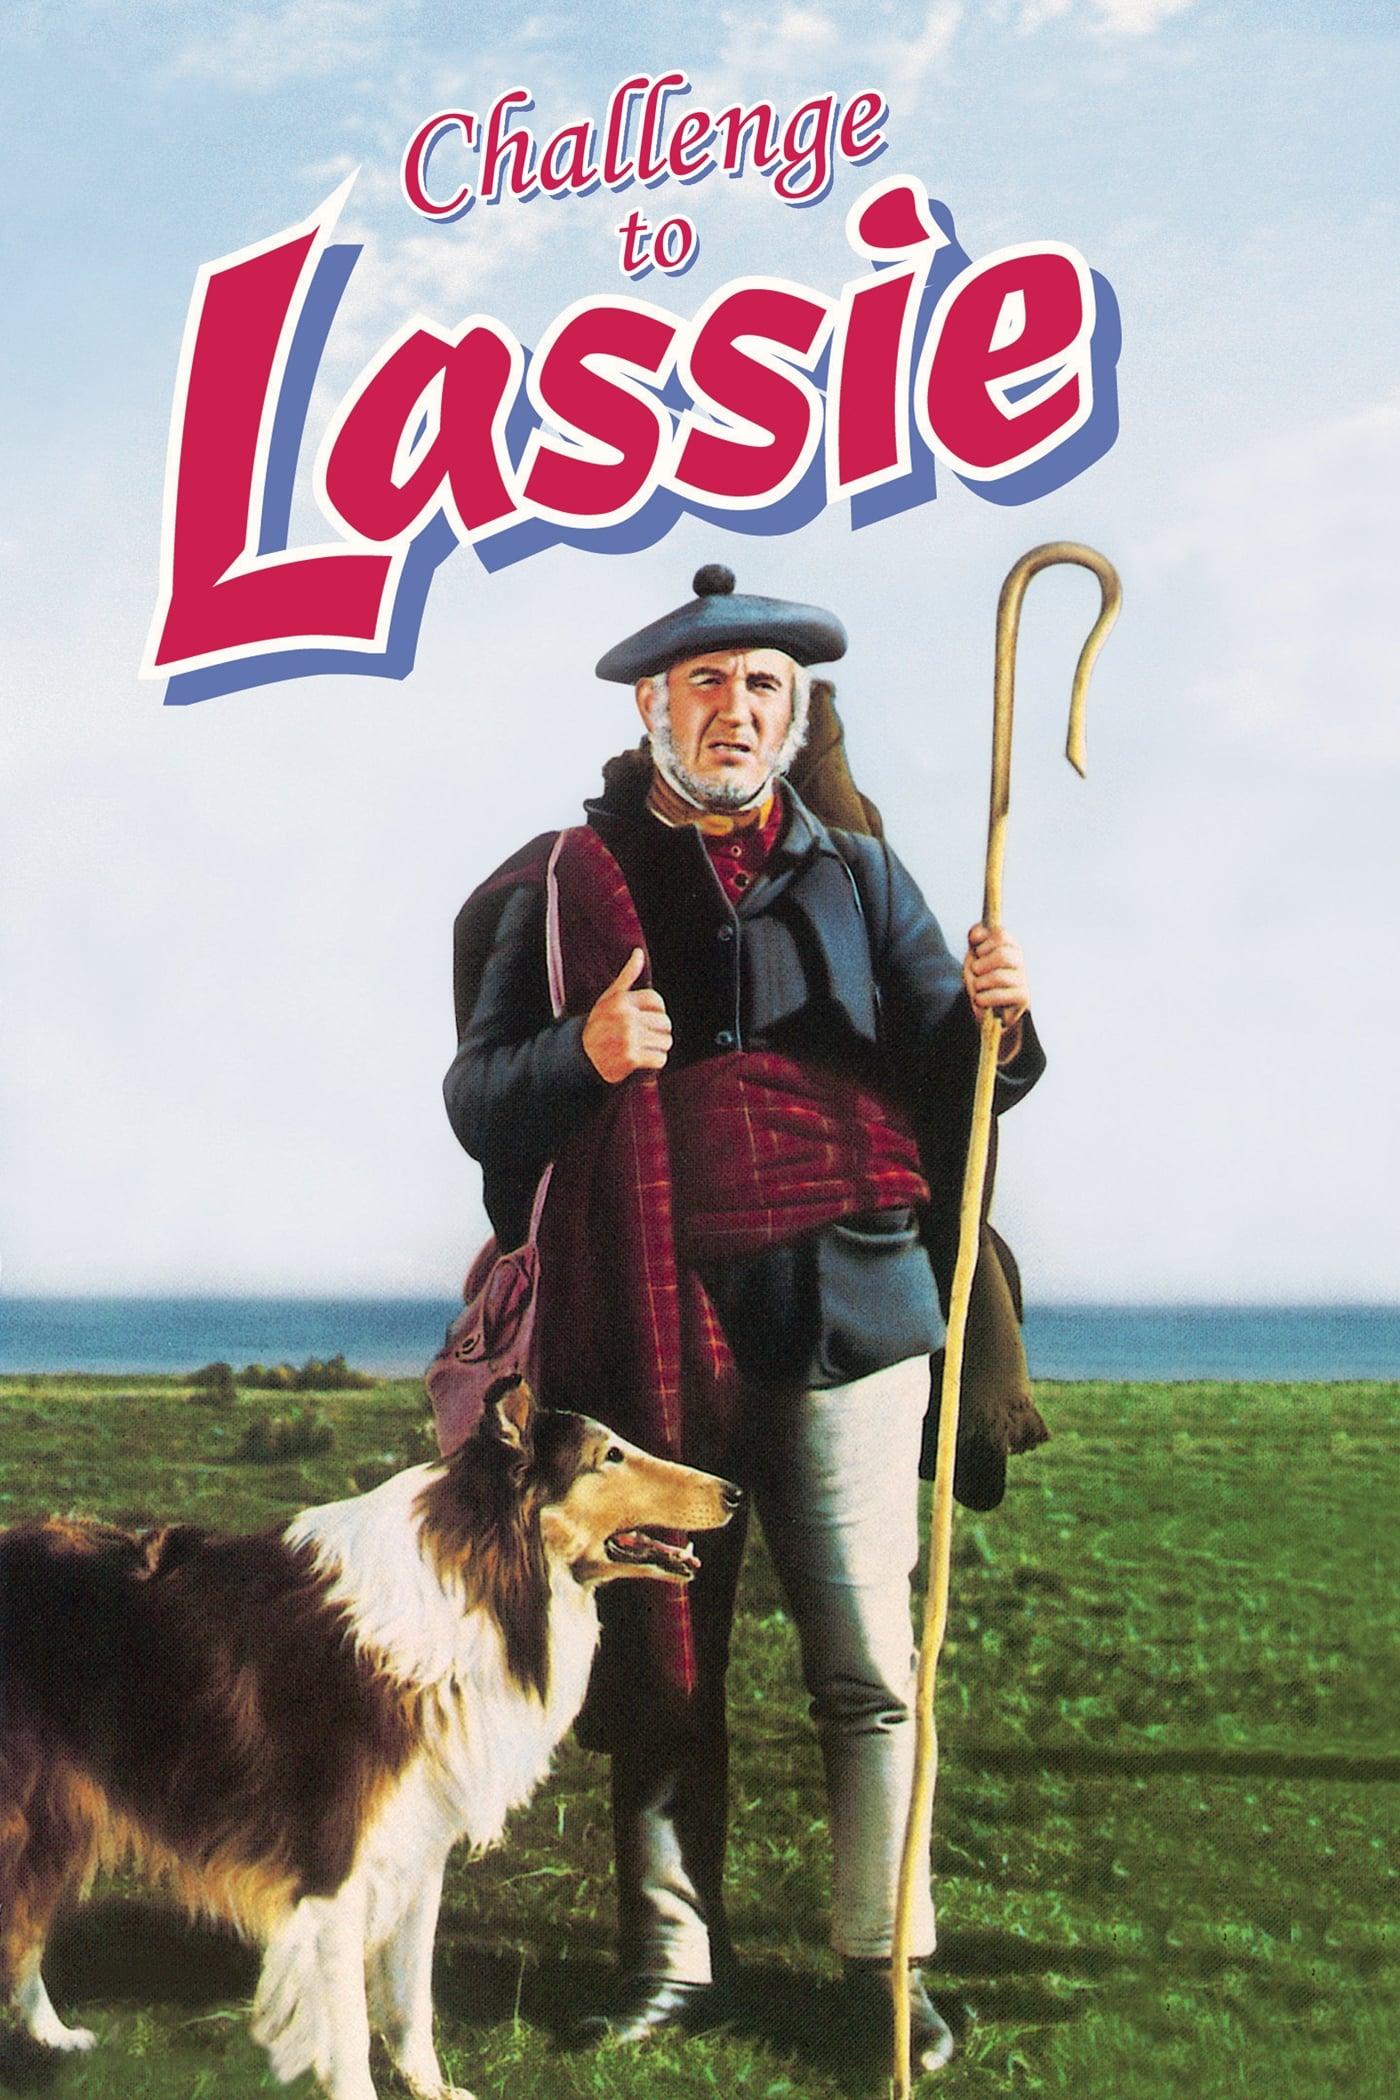 Challenge to Lassie (1949)